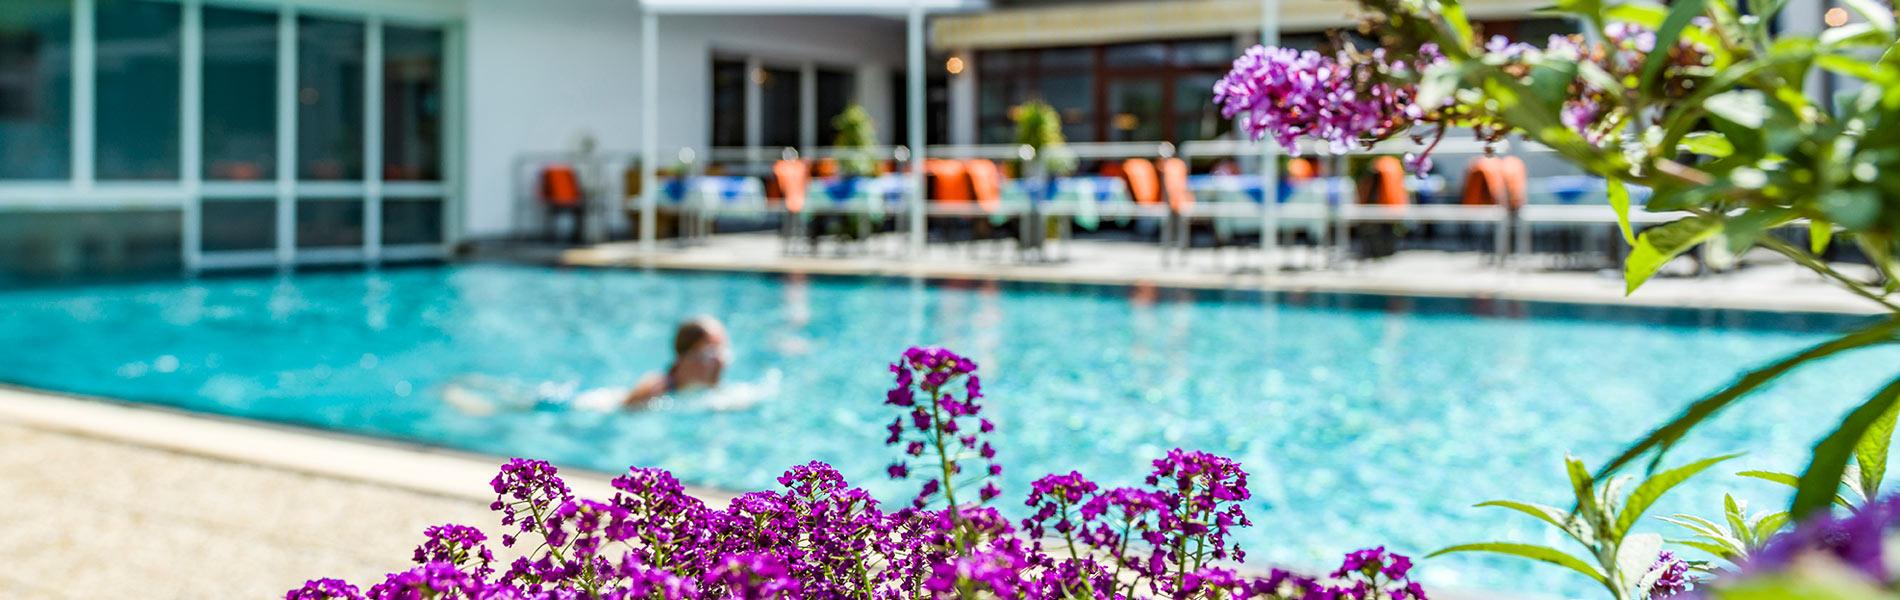 Hotel Happy Stubai Neustift Tirol Austria Pool